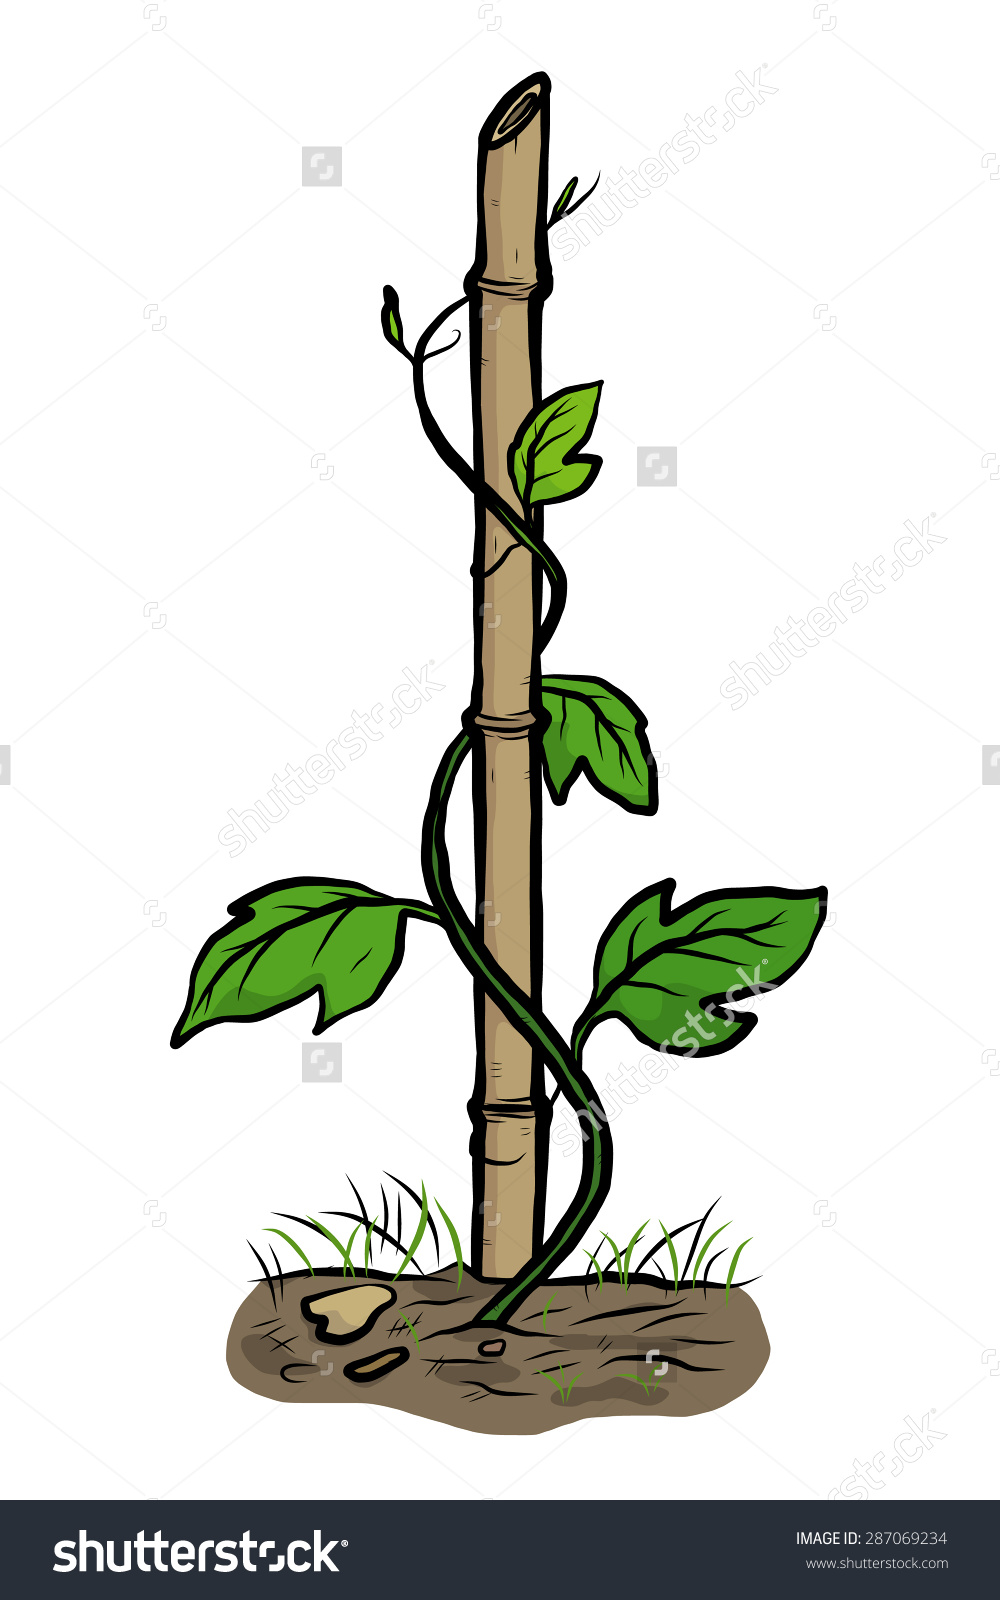 climbing plants clipart clipground grape vine clip art png grapevine clipart black and white